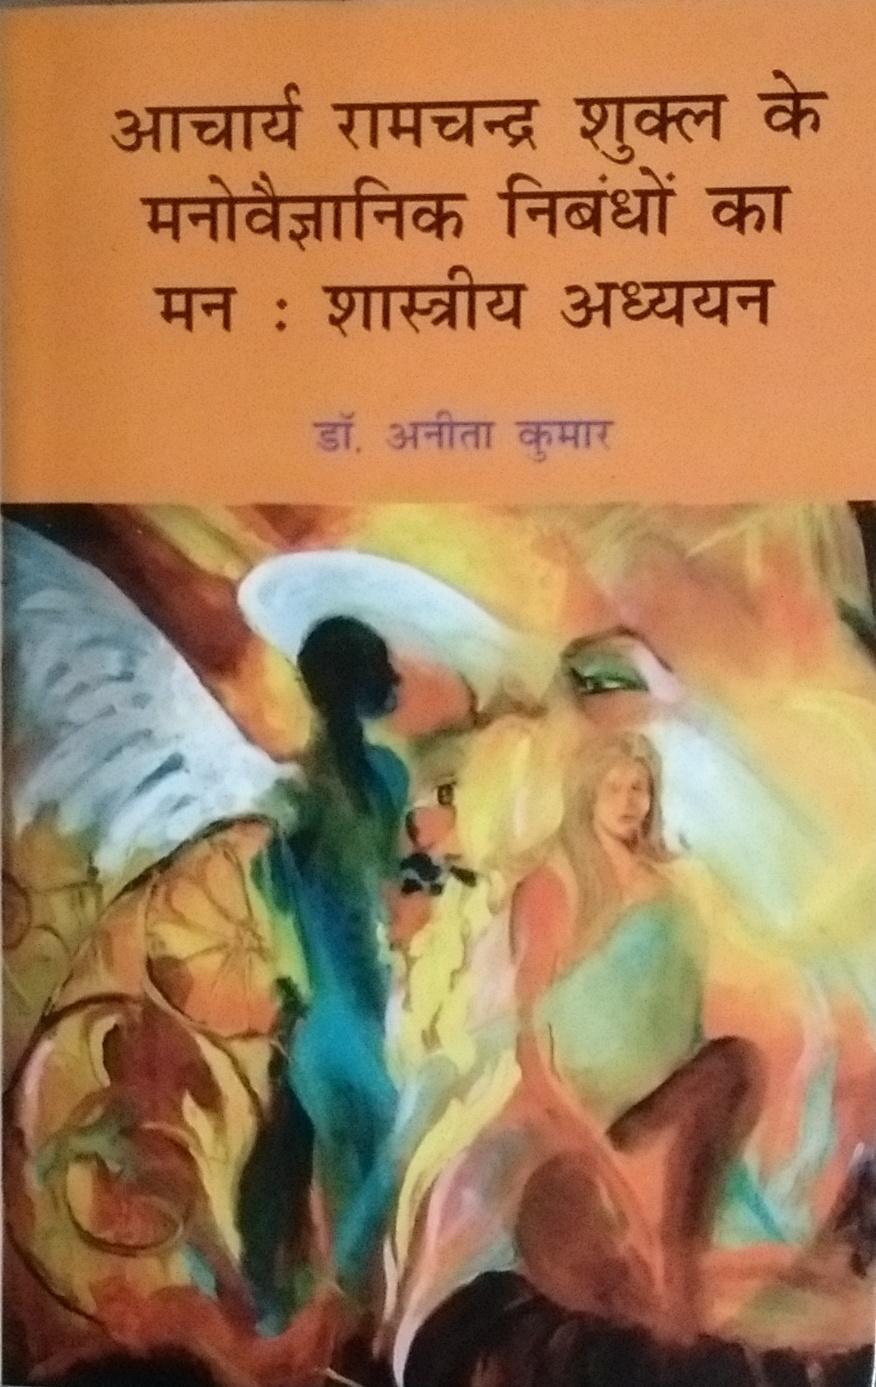 Acharya Ramchandra Shukl ke Manovaigyanik Nibando …